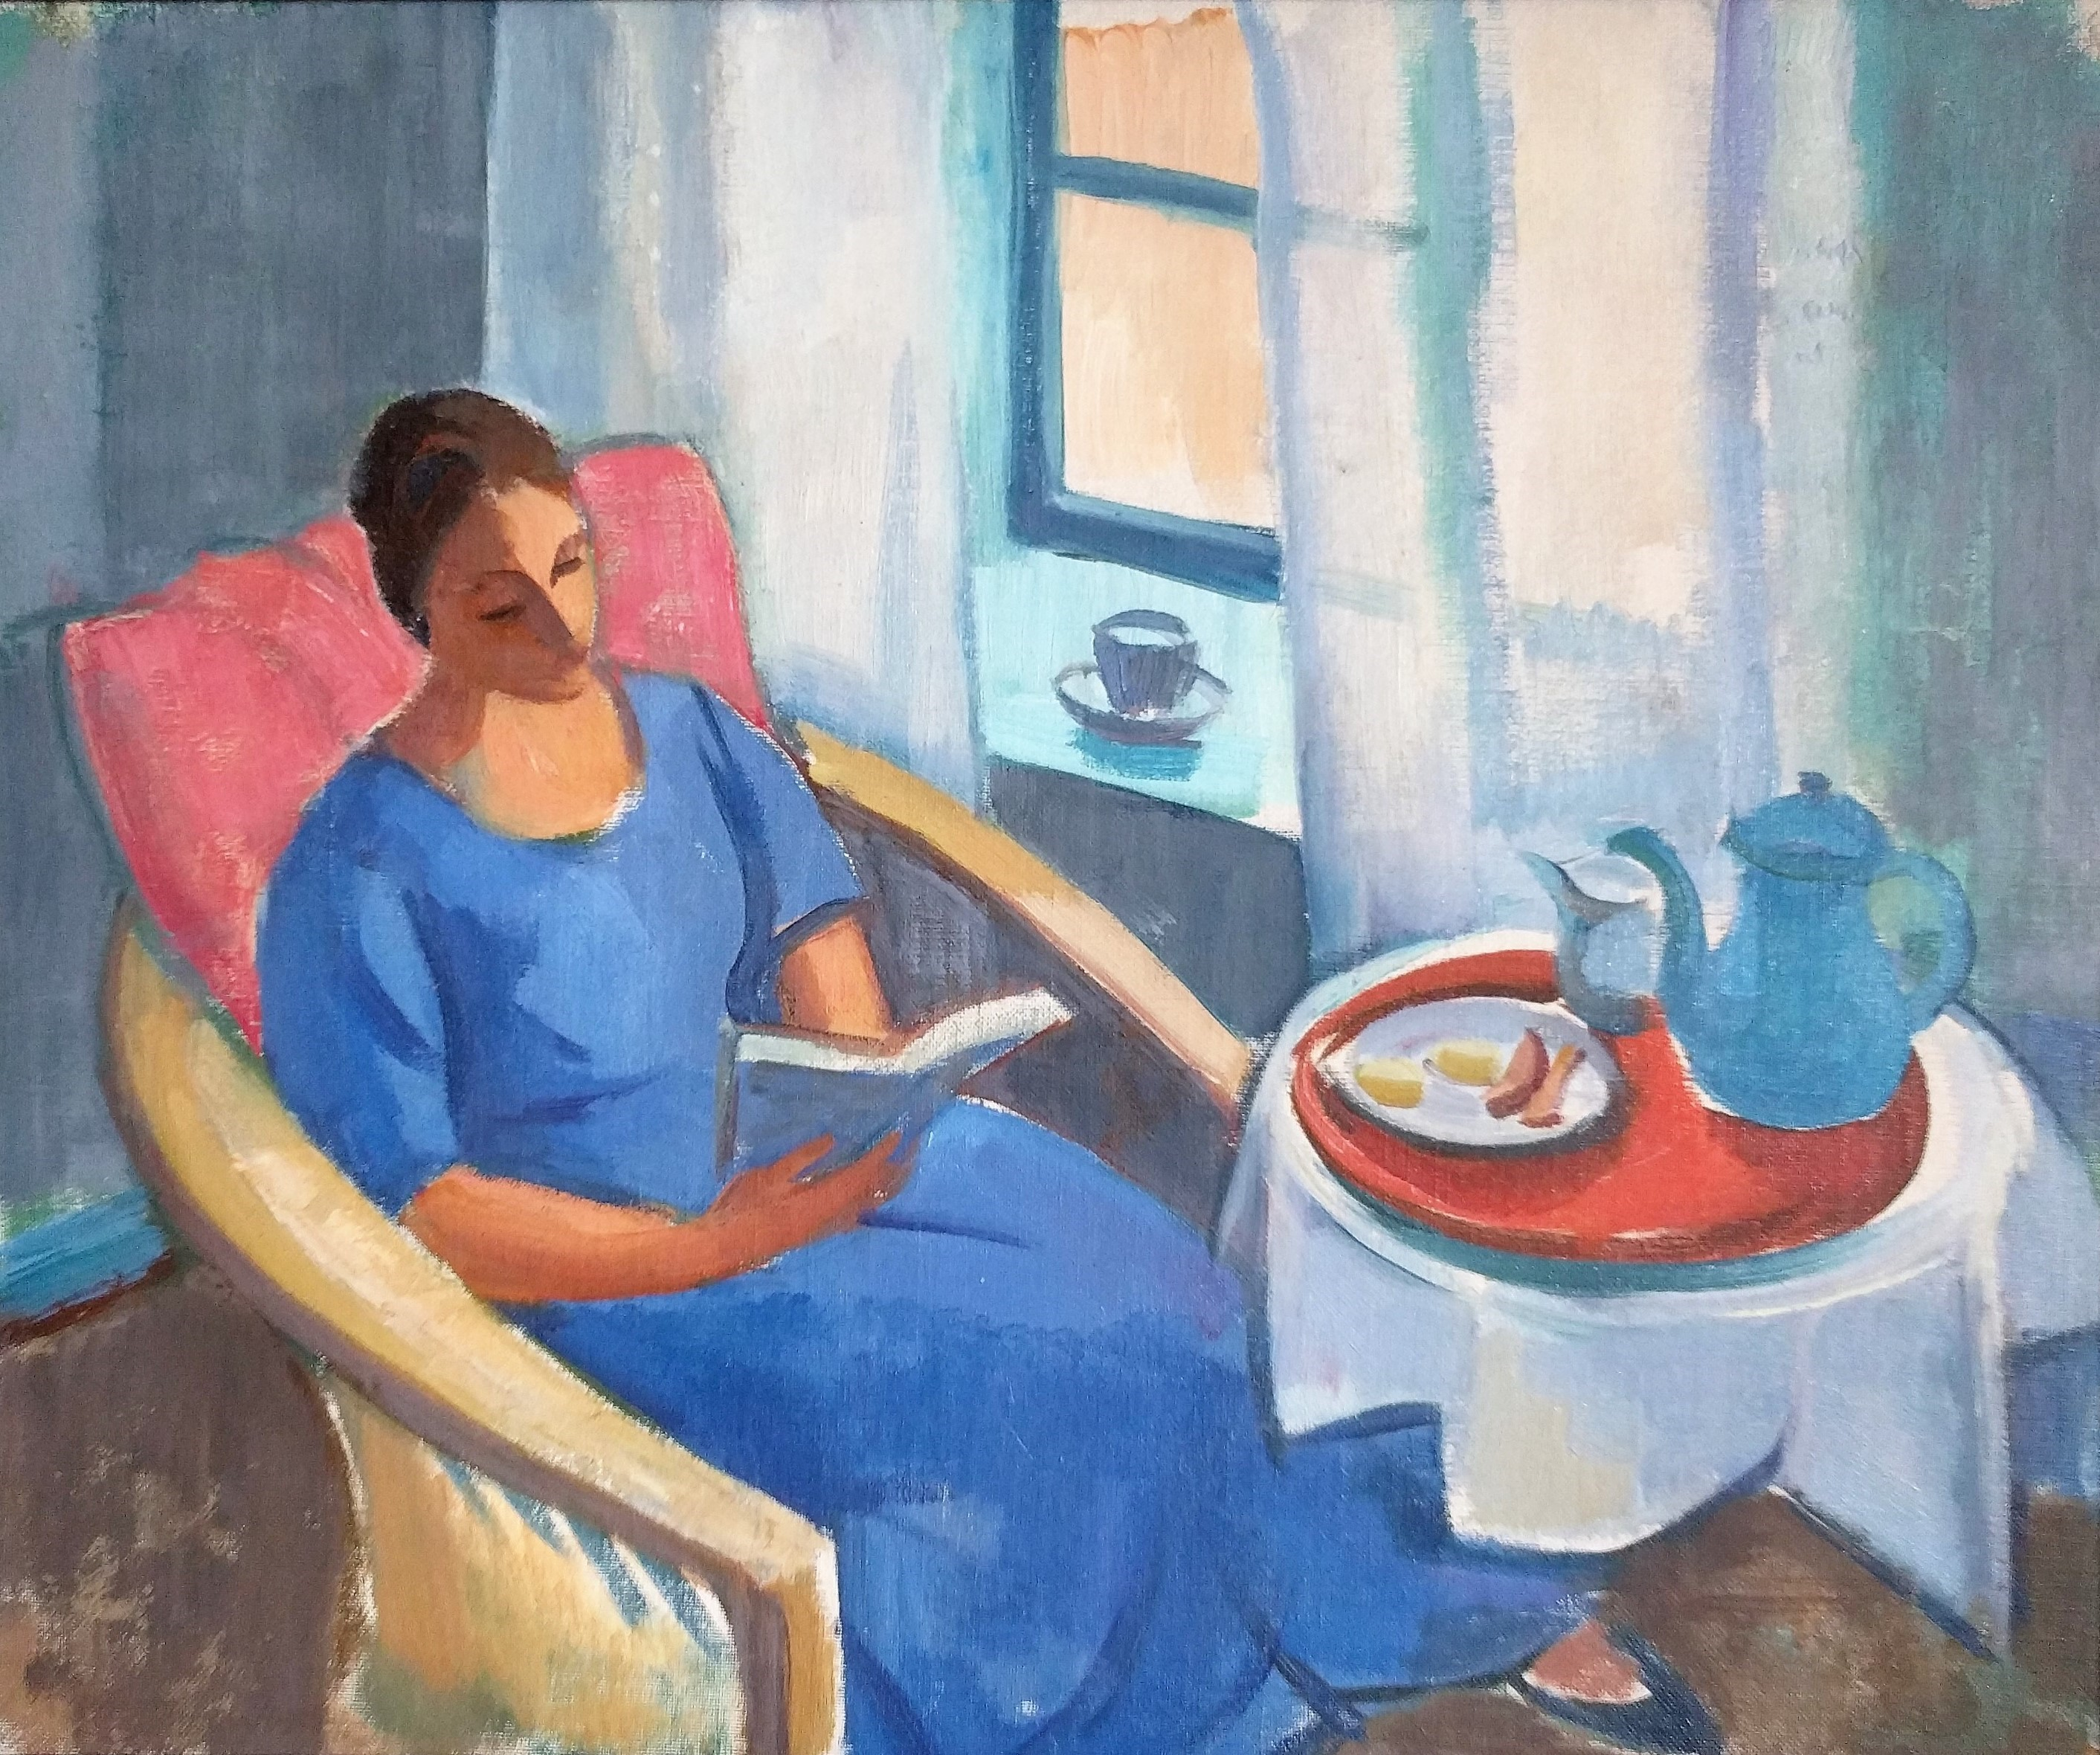 Gerda reading in her ...  by  Johan Johansson